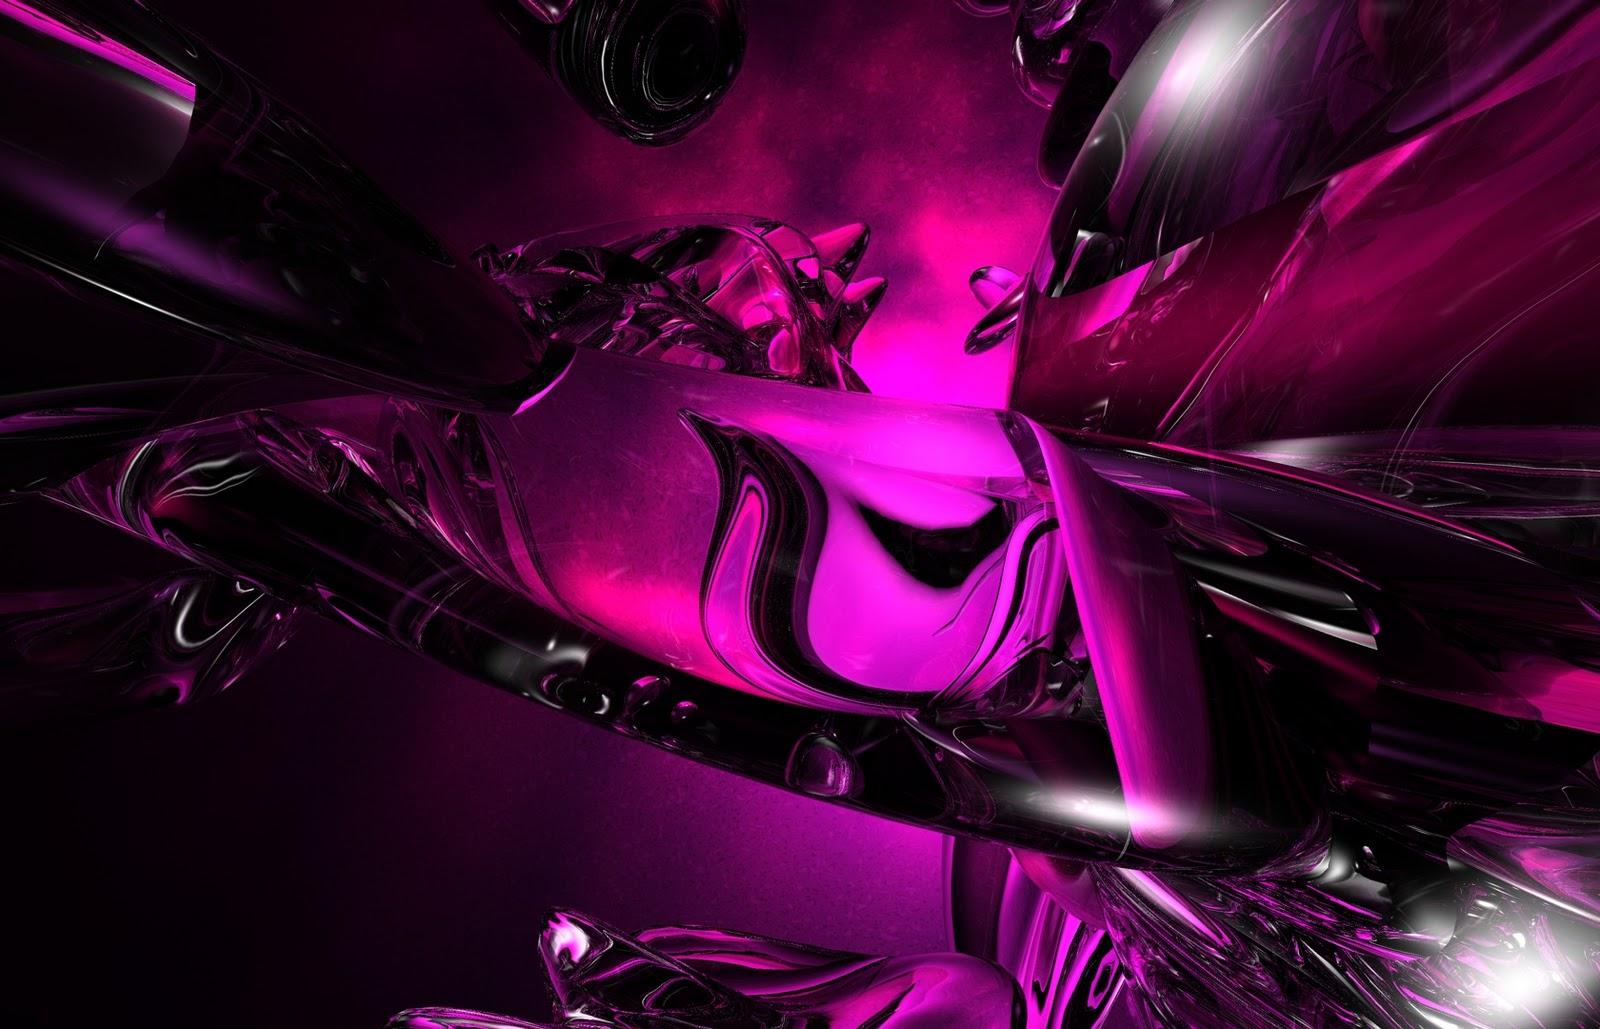 http://1.bp.blogspot.com/-Ze8-8zkQgYs/TyQJ4jcCZRI/AAAAAAAADSc/XbtPL8Yikds/s1600/purple-wallpaper-download.jpg